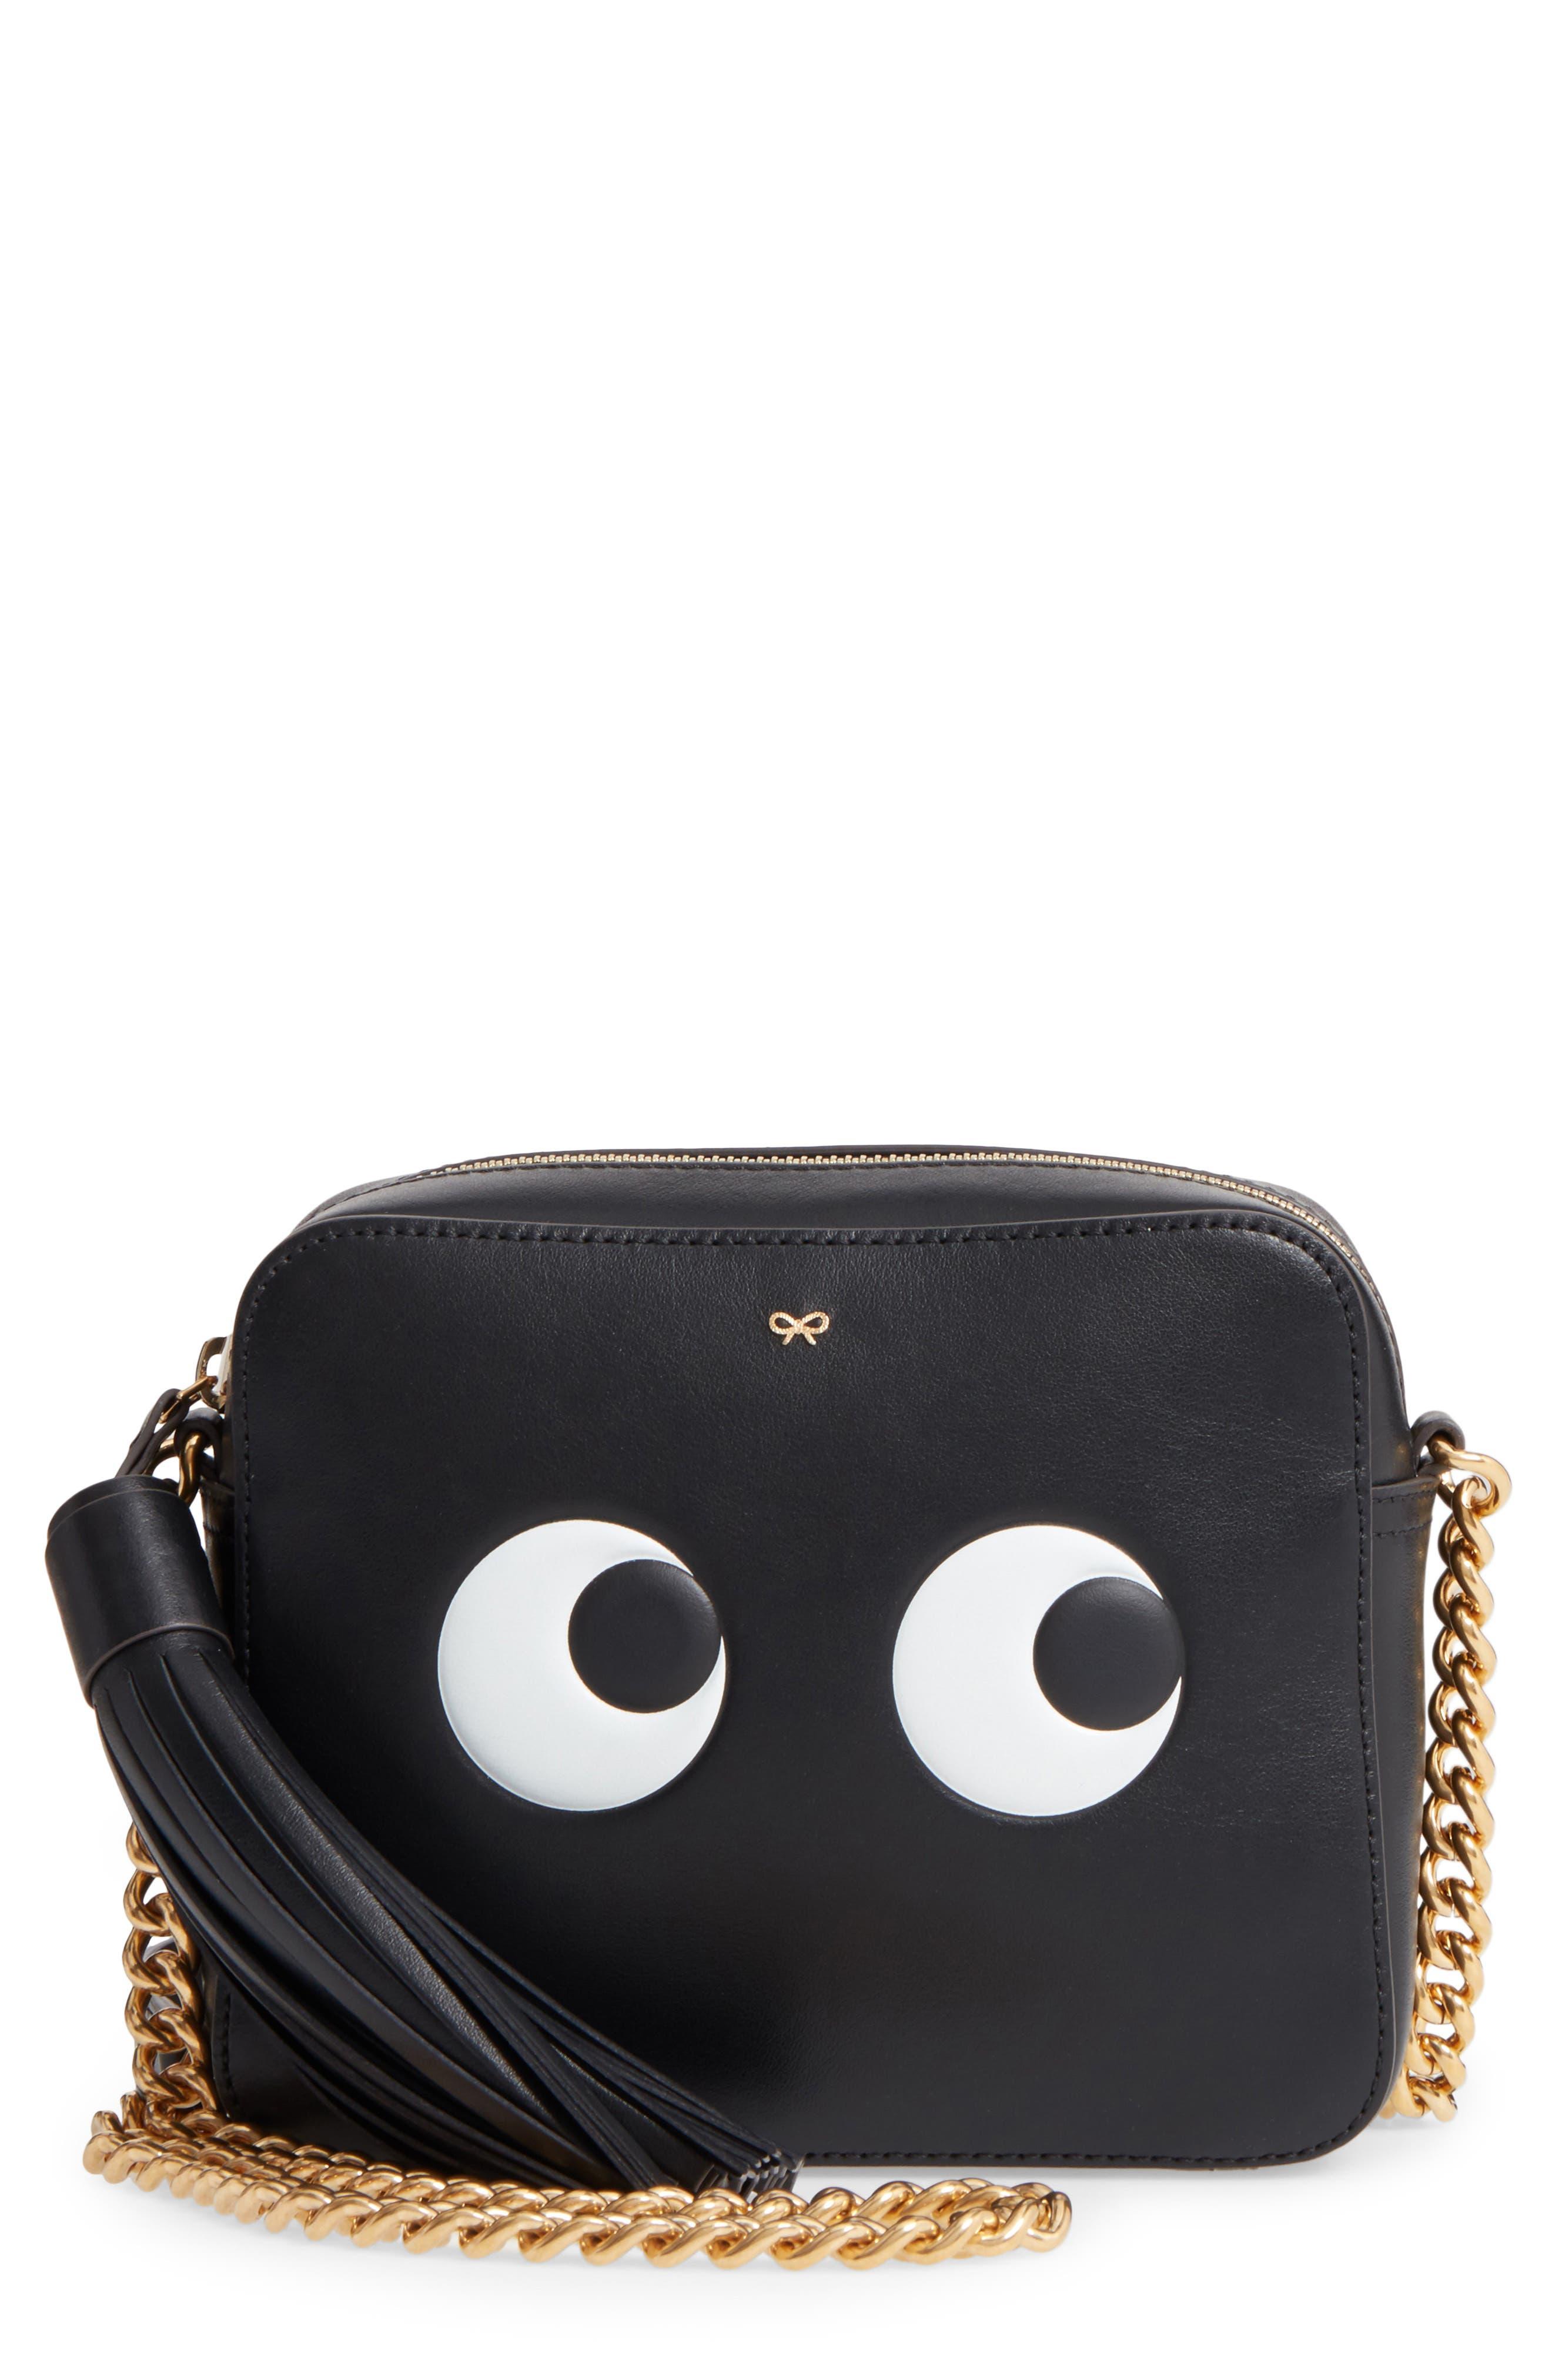 Eyes Camera Leather Crossbody Bag,                             Main thumbnail 1, color,                             BLACK